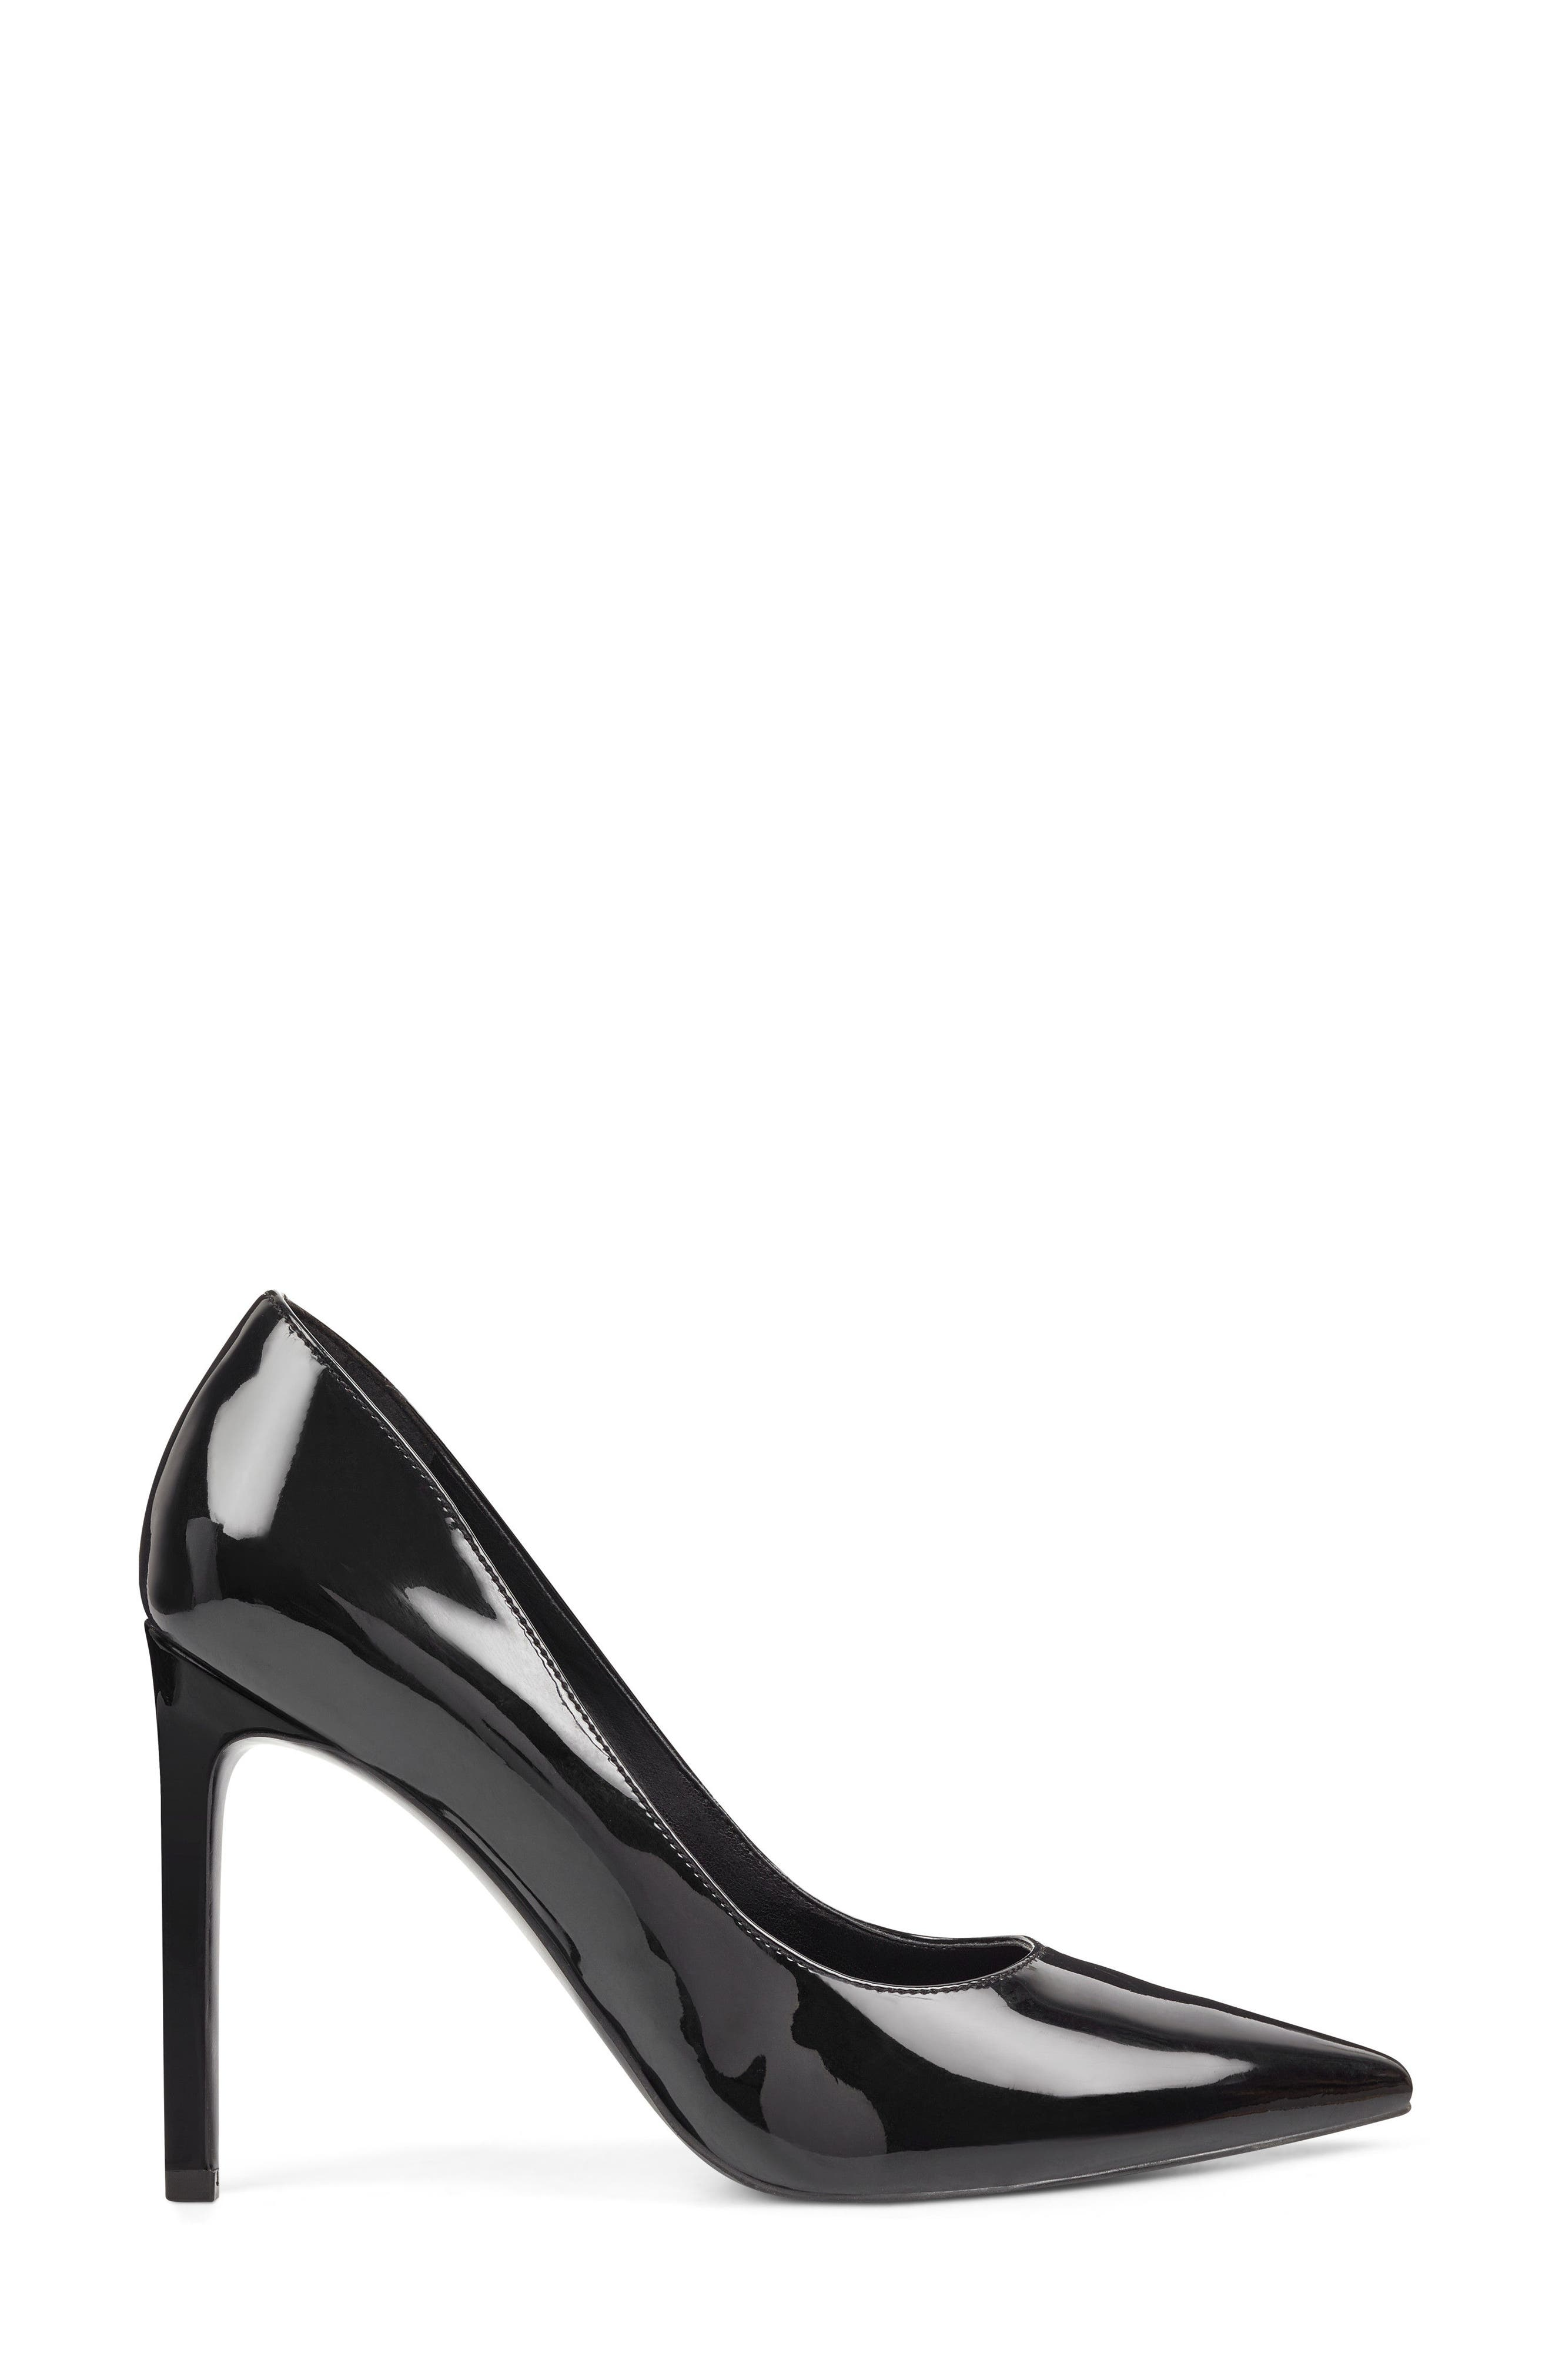 'Tatiana' Pointy Toe Pump,                             Alternate thumbnail 6, color,                             Black Sleek Patent